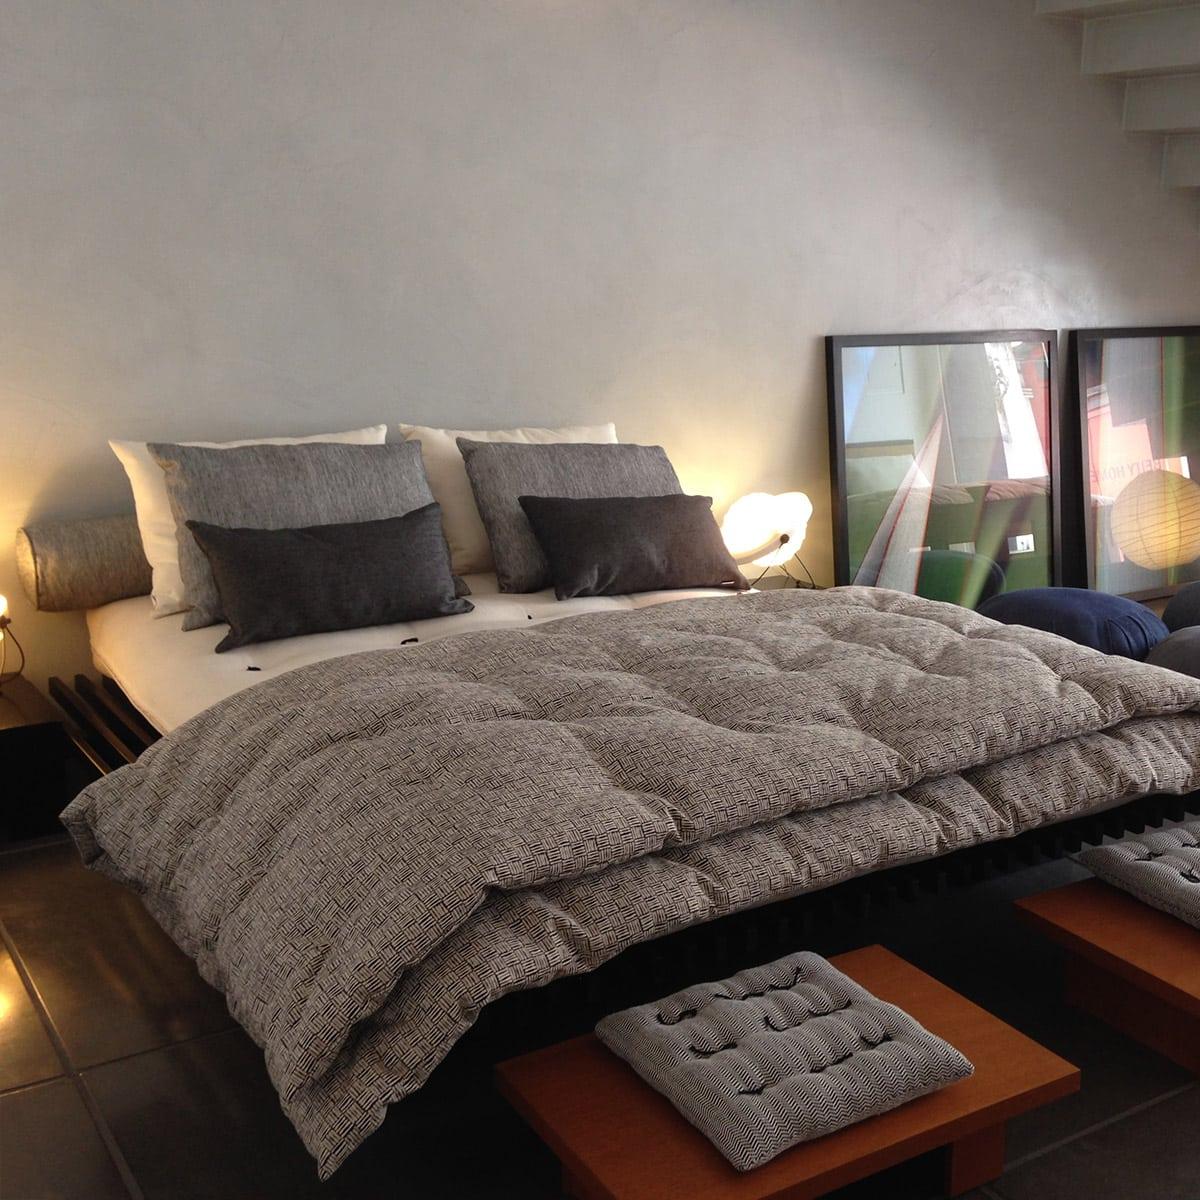 Cama casal futon company for Cama cama cama